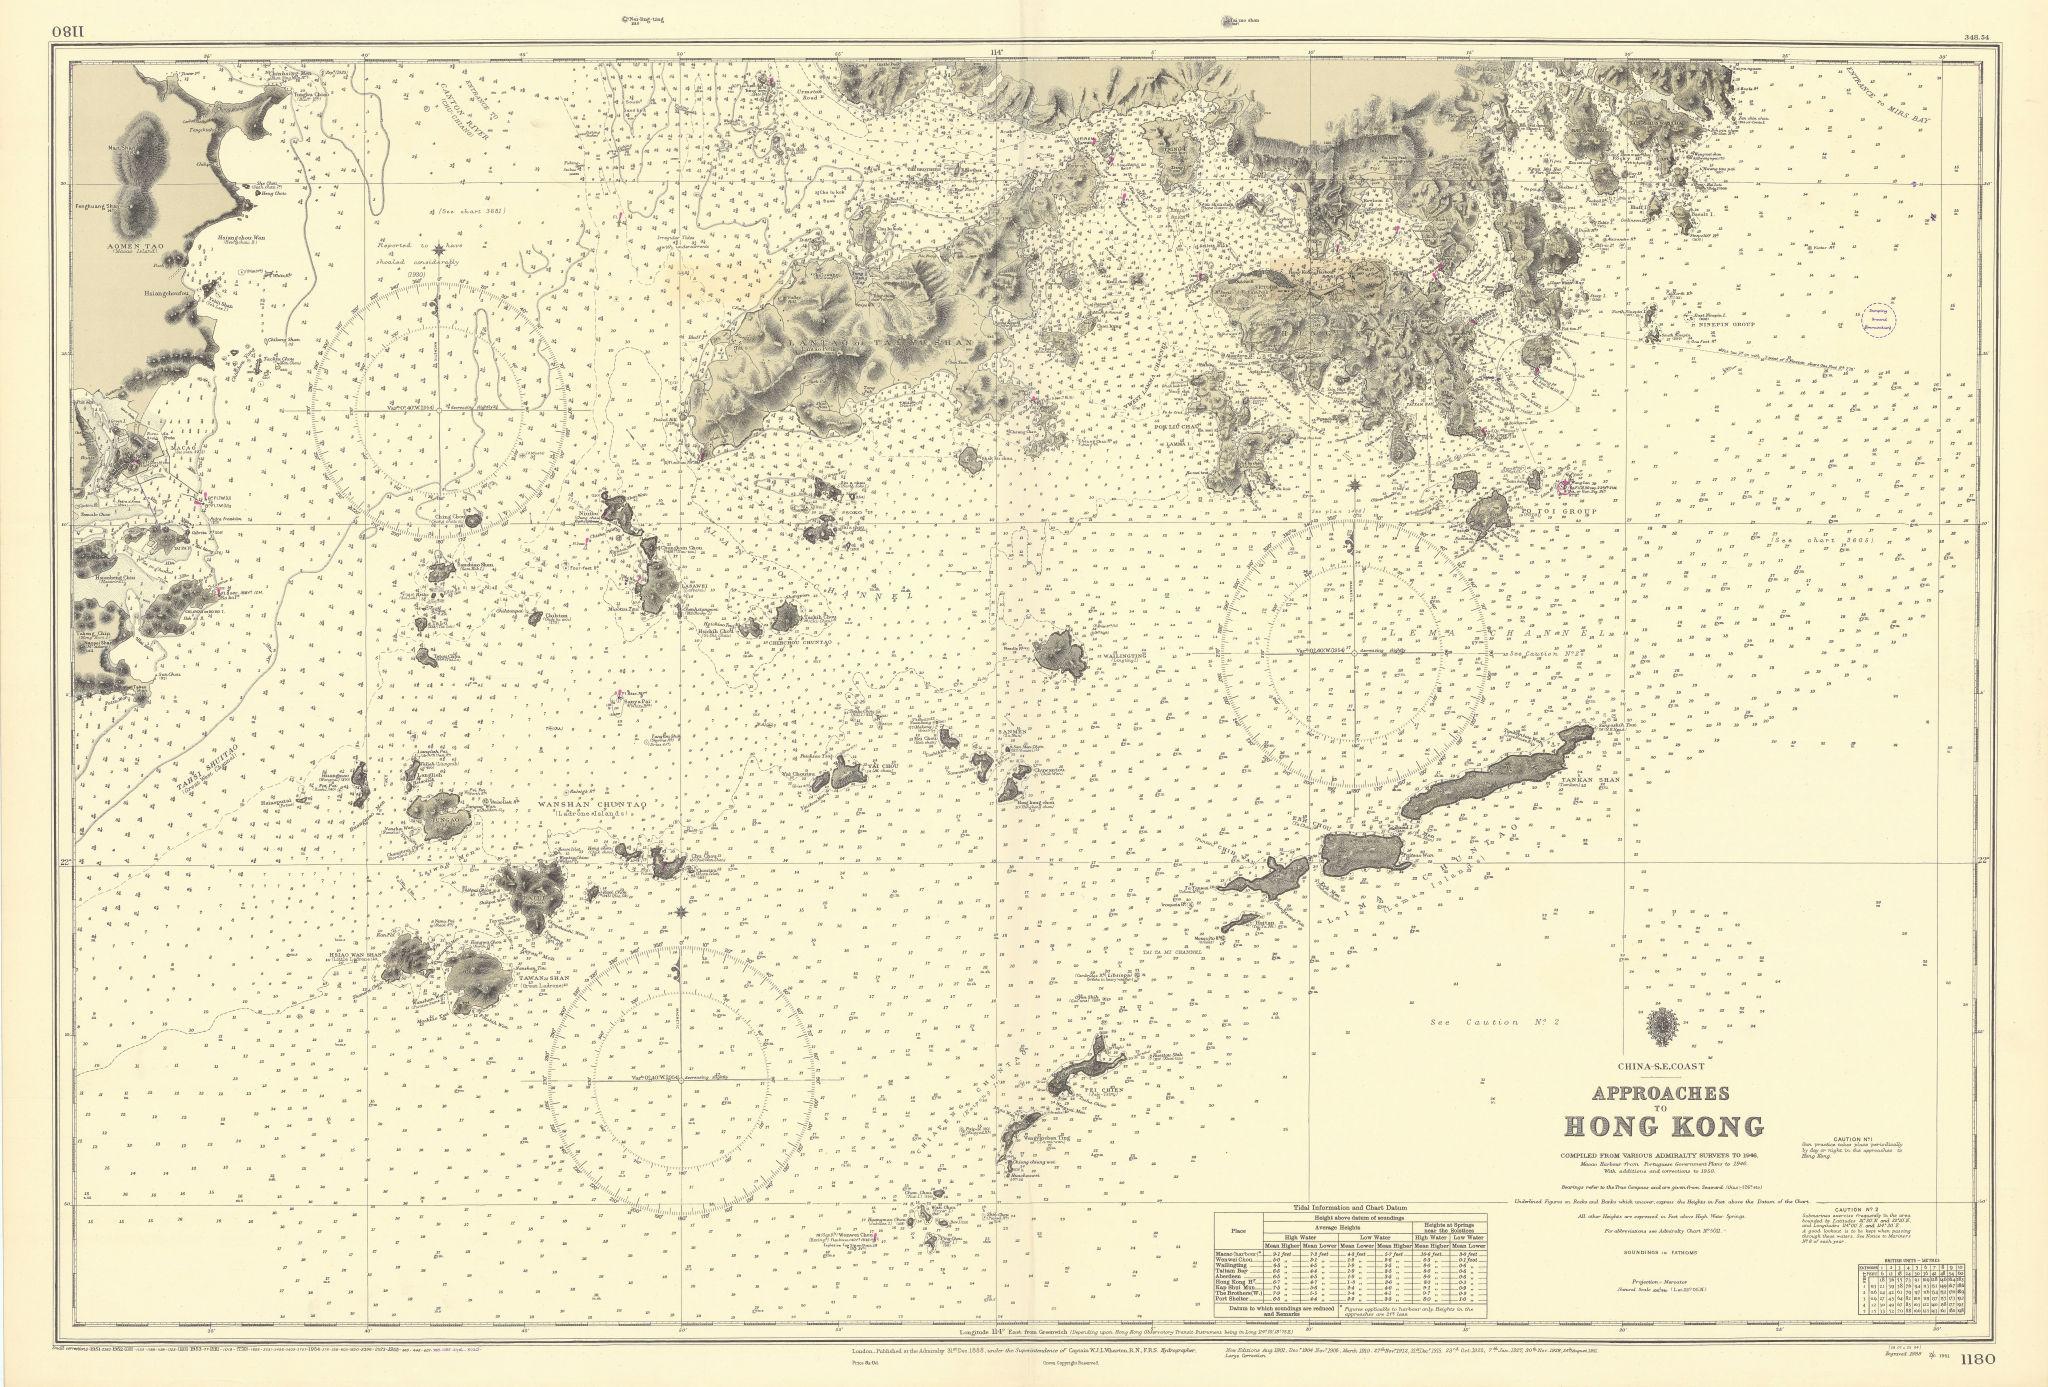 Hong Kong approaches Macao Pearl River China ADMIRALTY sea chart 1888 (1955) map